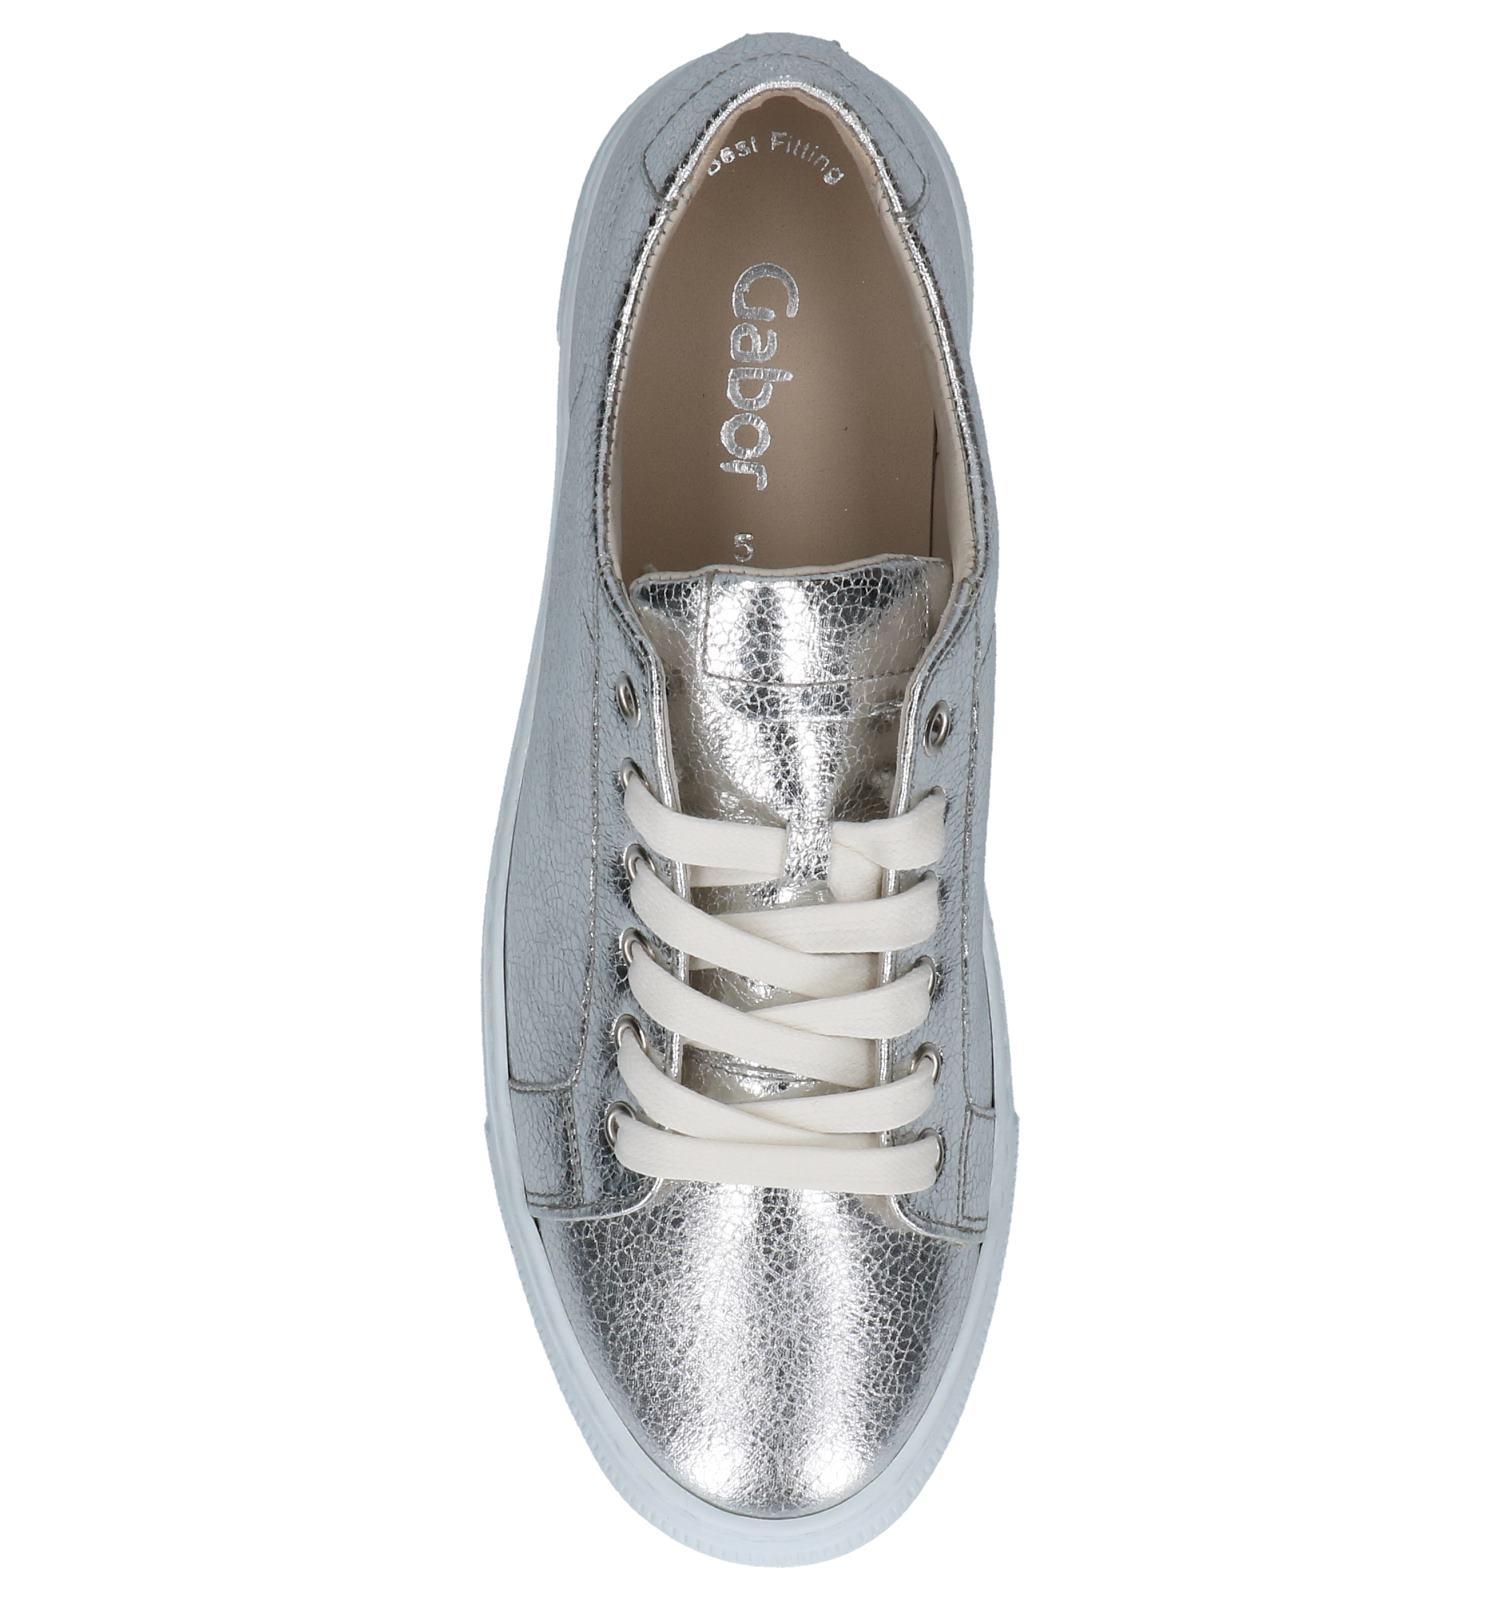 5cec937aab1 Lage Geklede Sneakers Zilver Gabor Best Fitting | TORFS.BE | Gratis verzend  en retour